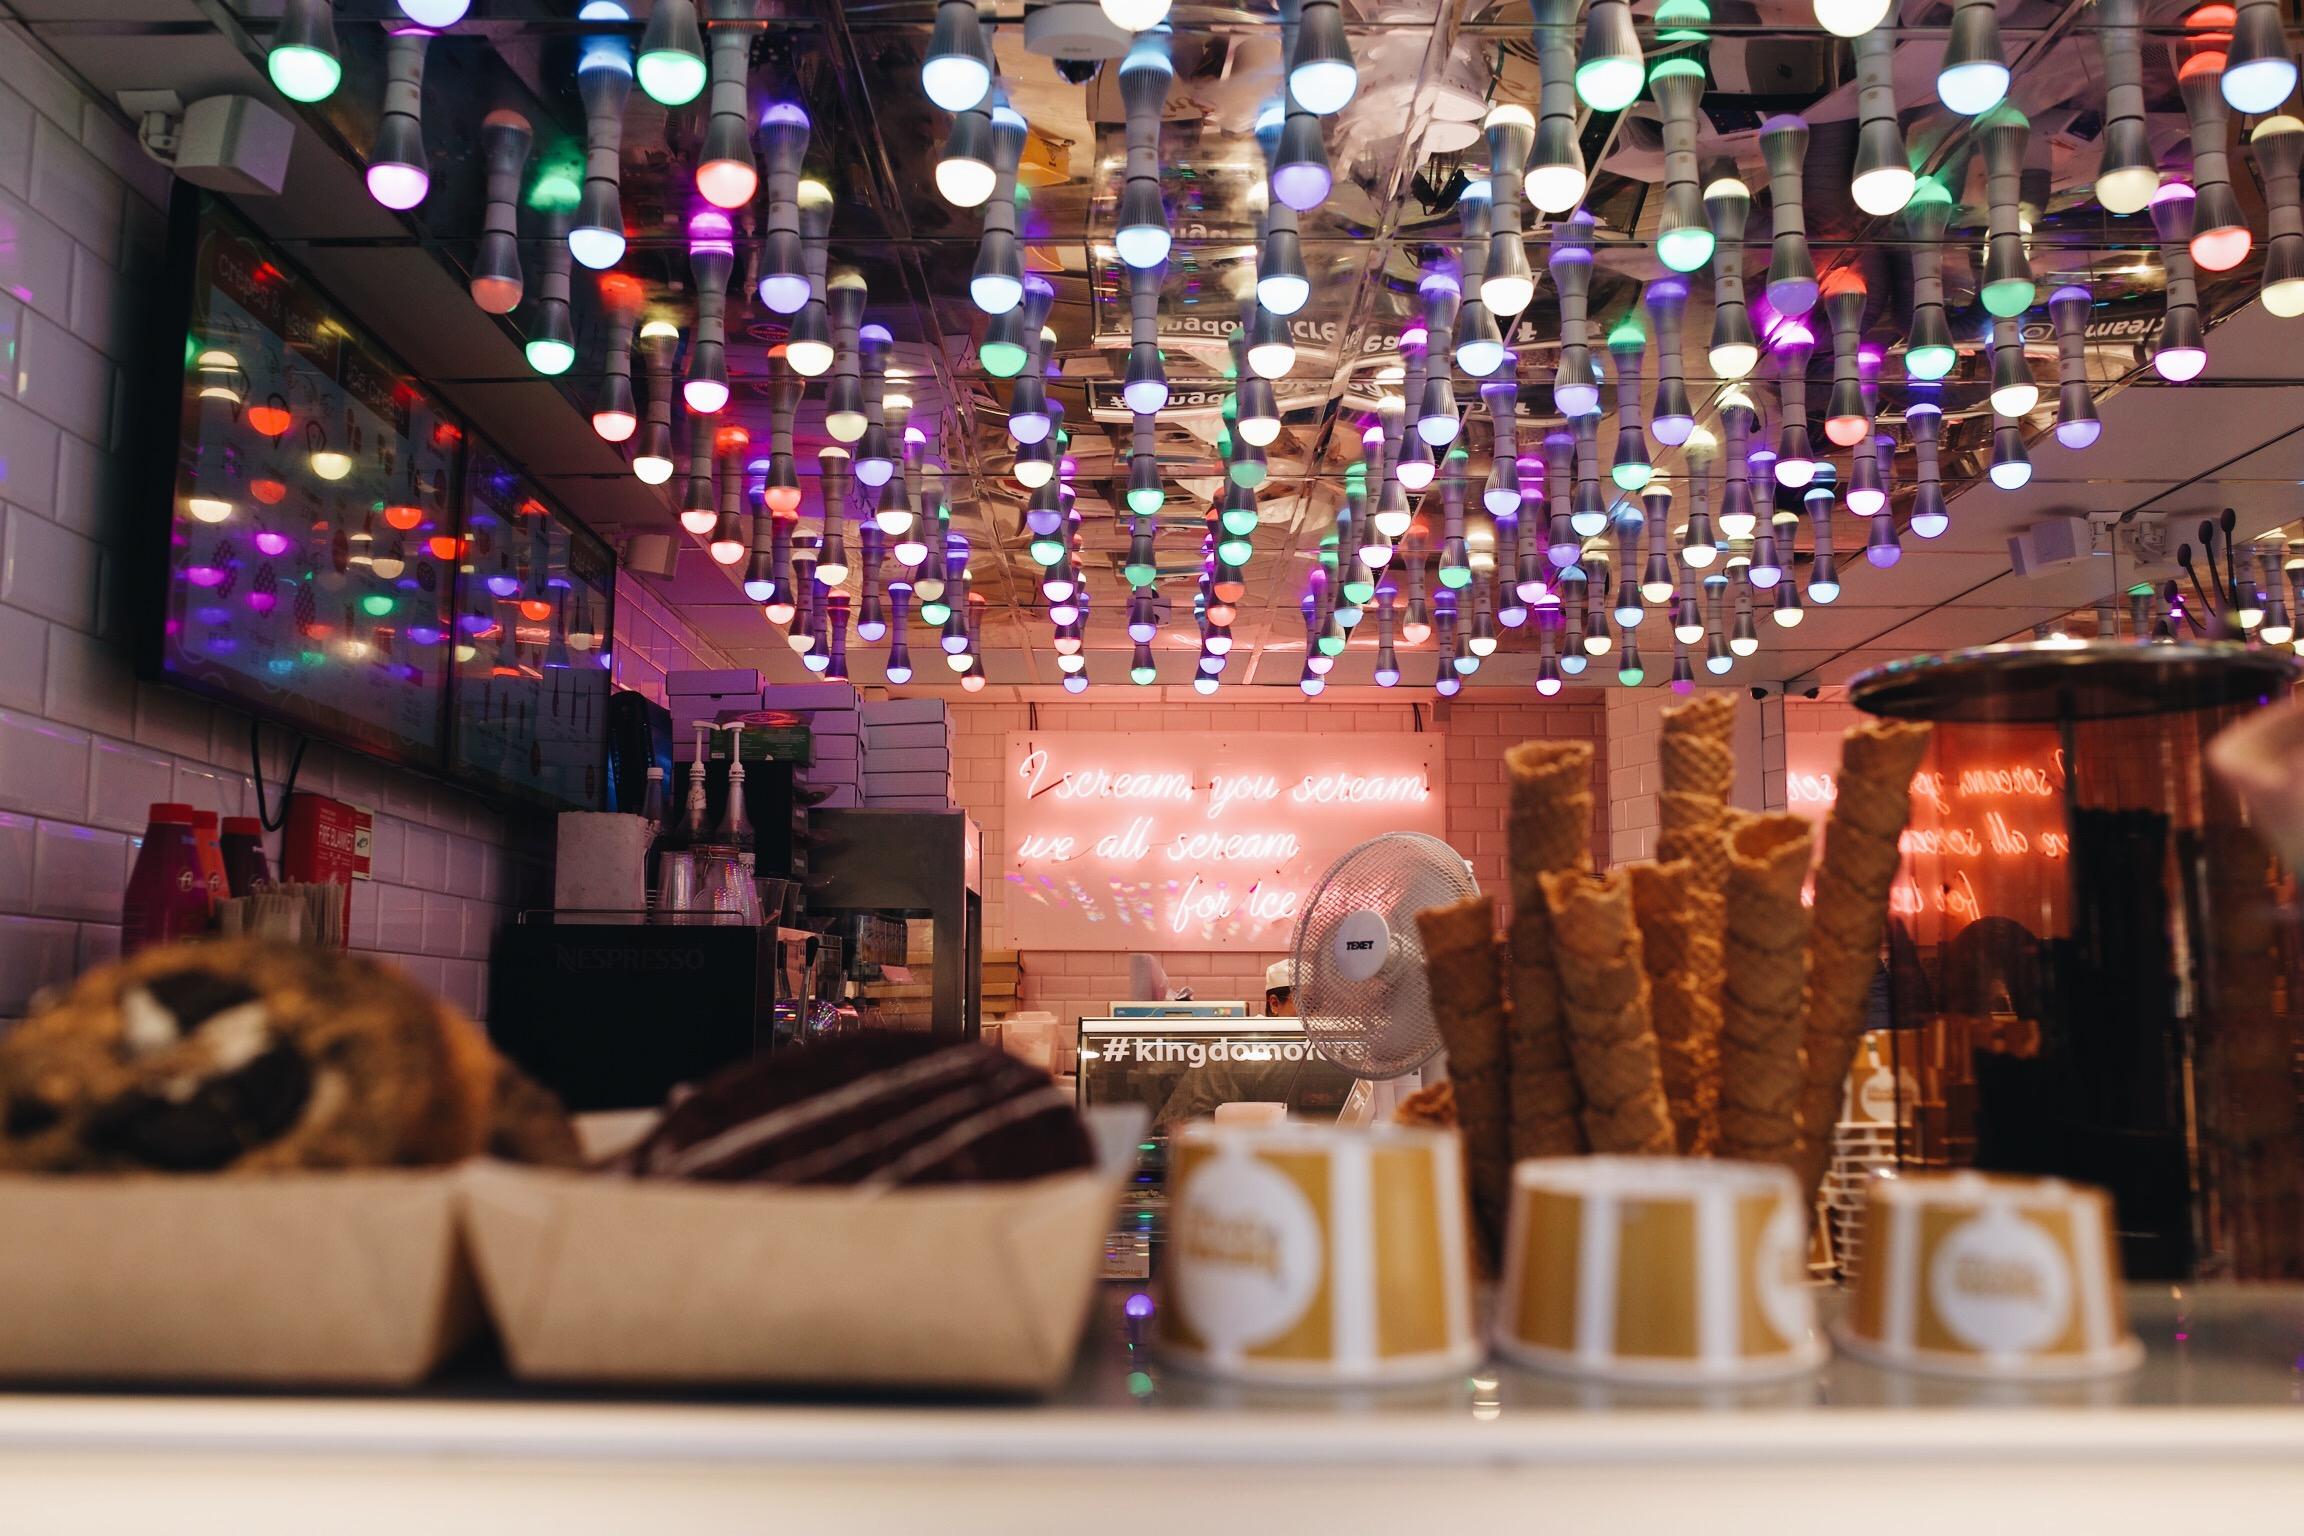 La jolie boutique de Kingdom Of Creams sur Leicester Square